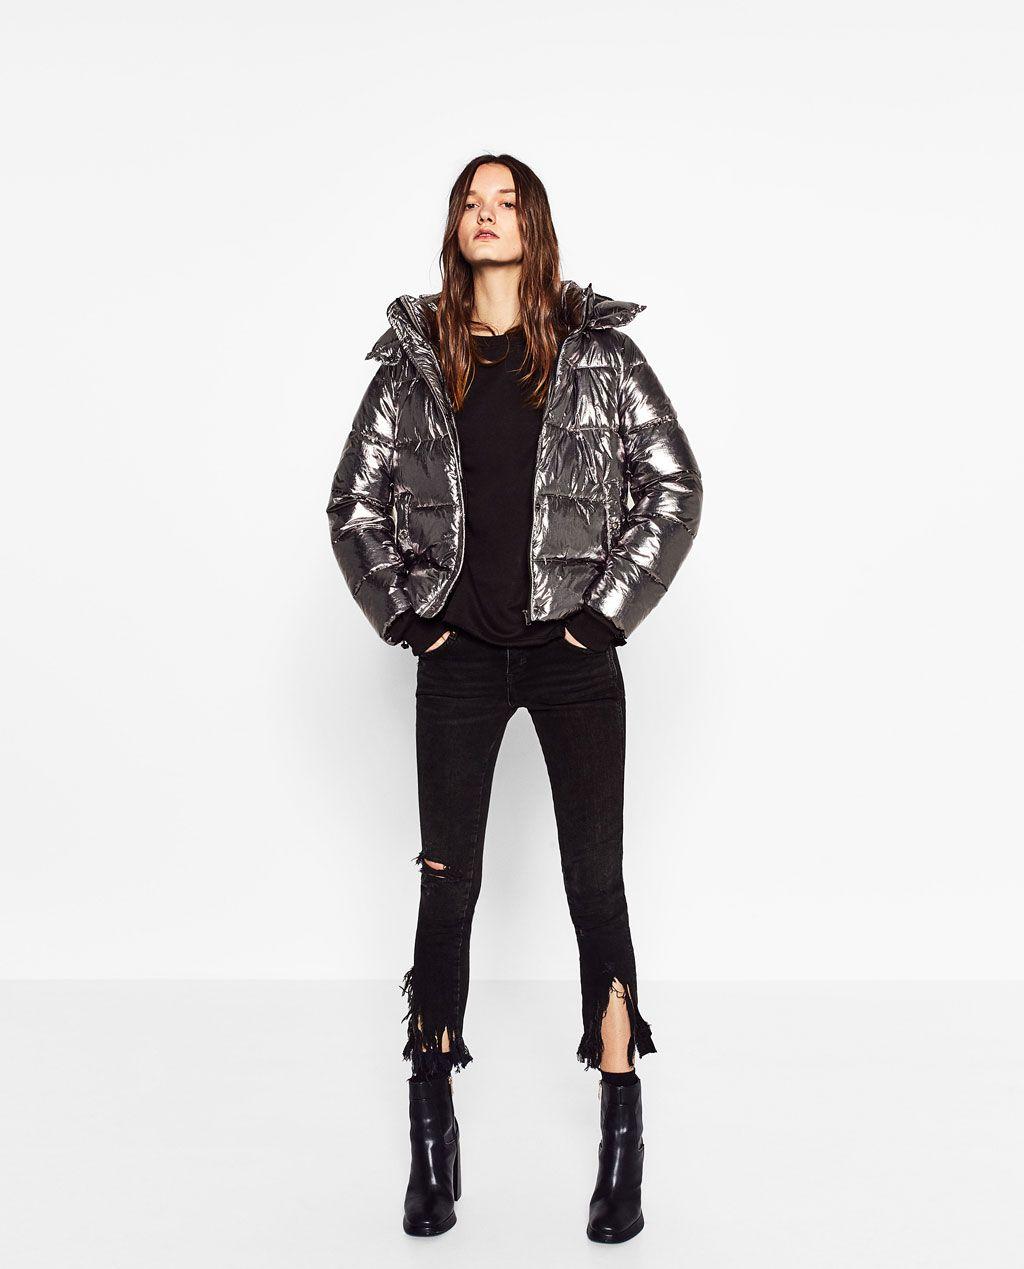 Short Metallic Jacket Puffers Outerwear Woman Zara United States Metallic Jacket Silver Jacket Outfit Puffer Jacket Outfit [ 1269 x 1024 Pixel ]